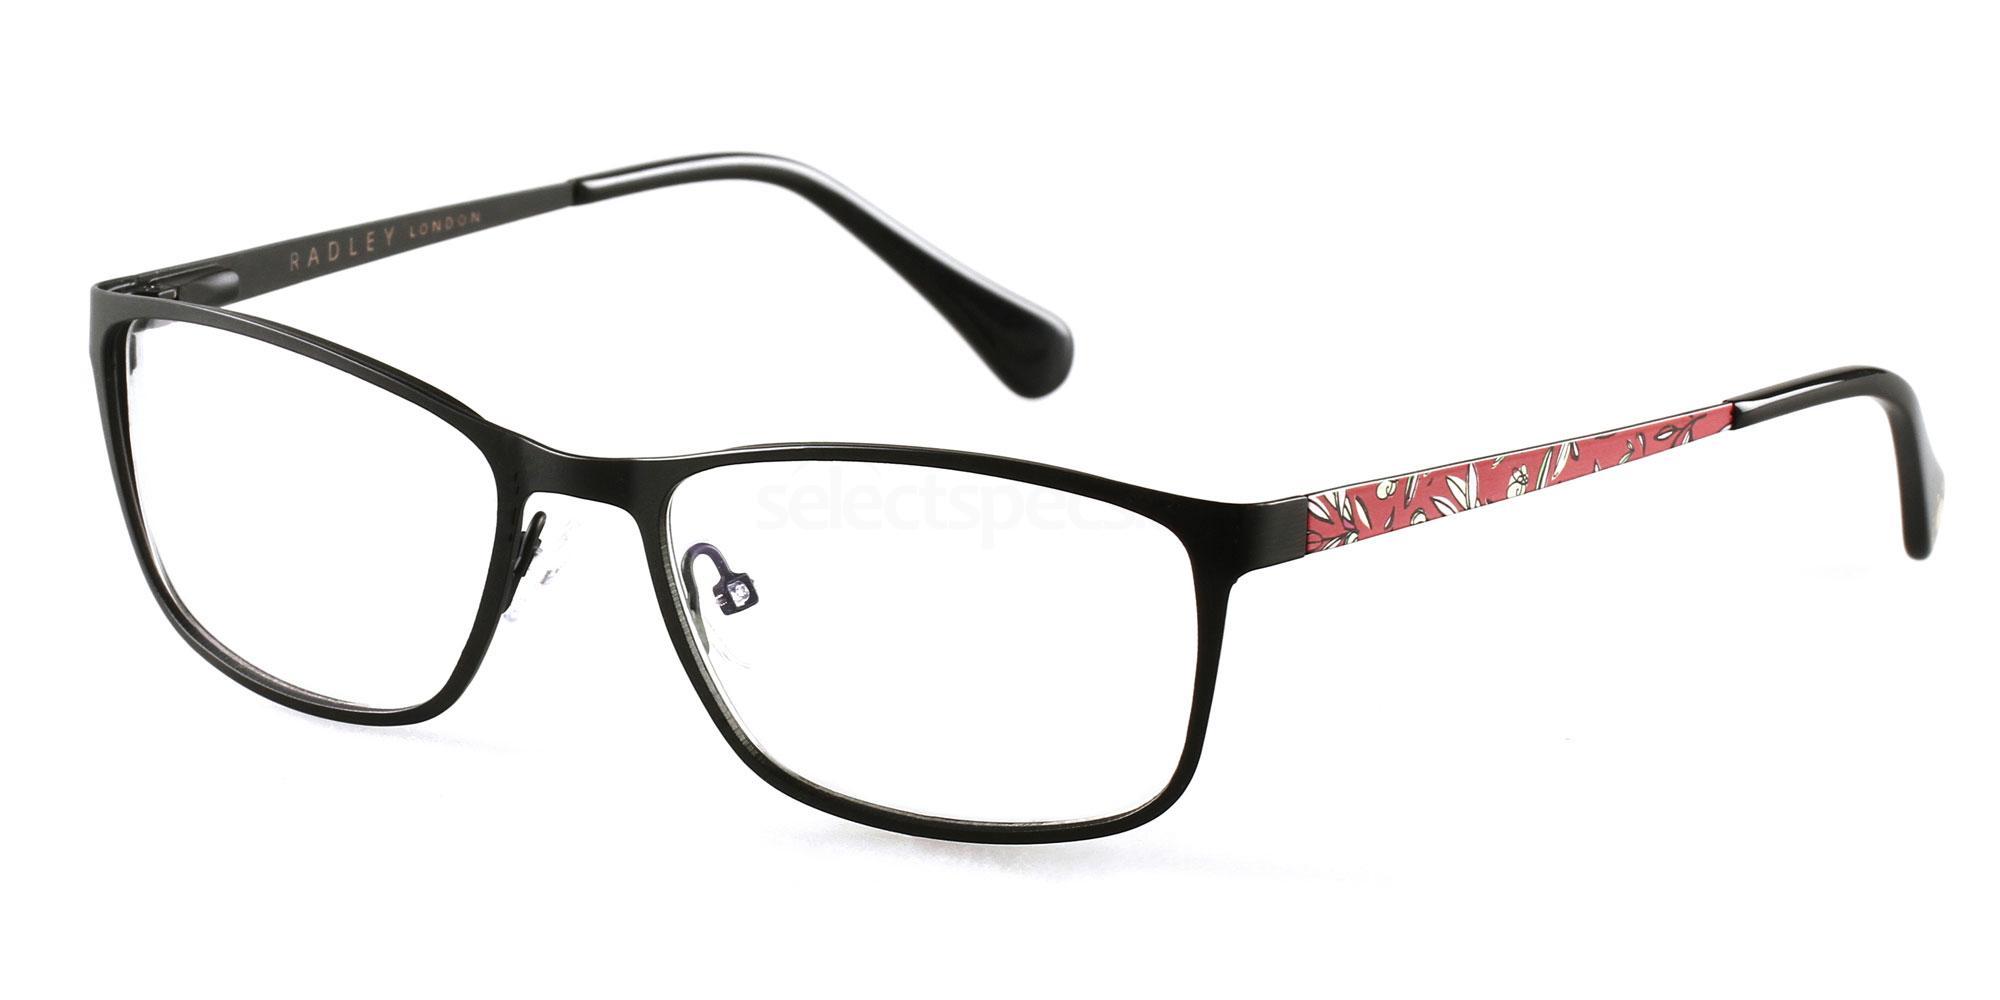 004 RDO-IVY Glasses, Radley London